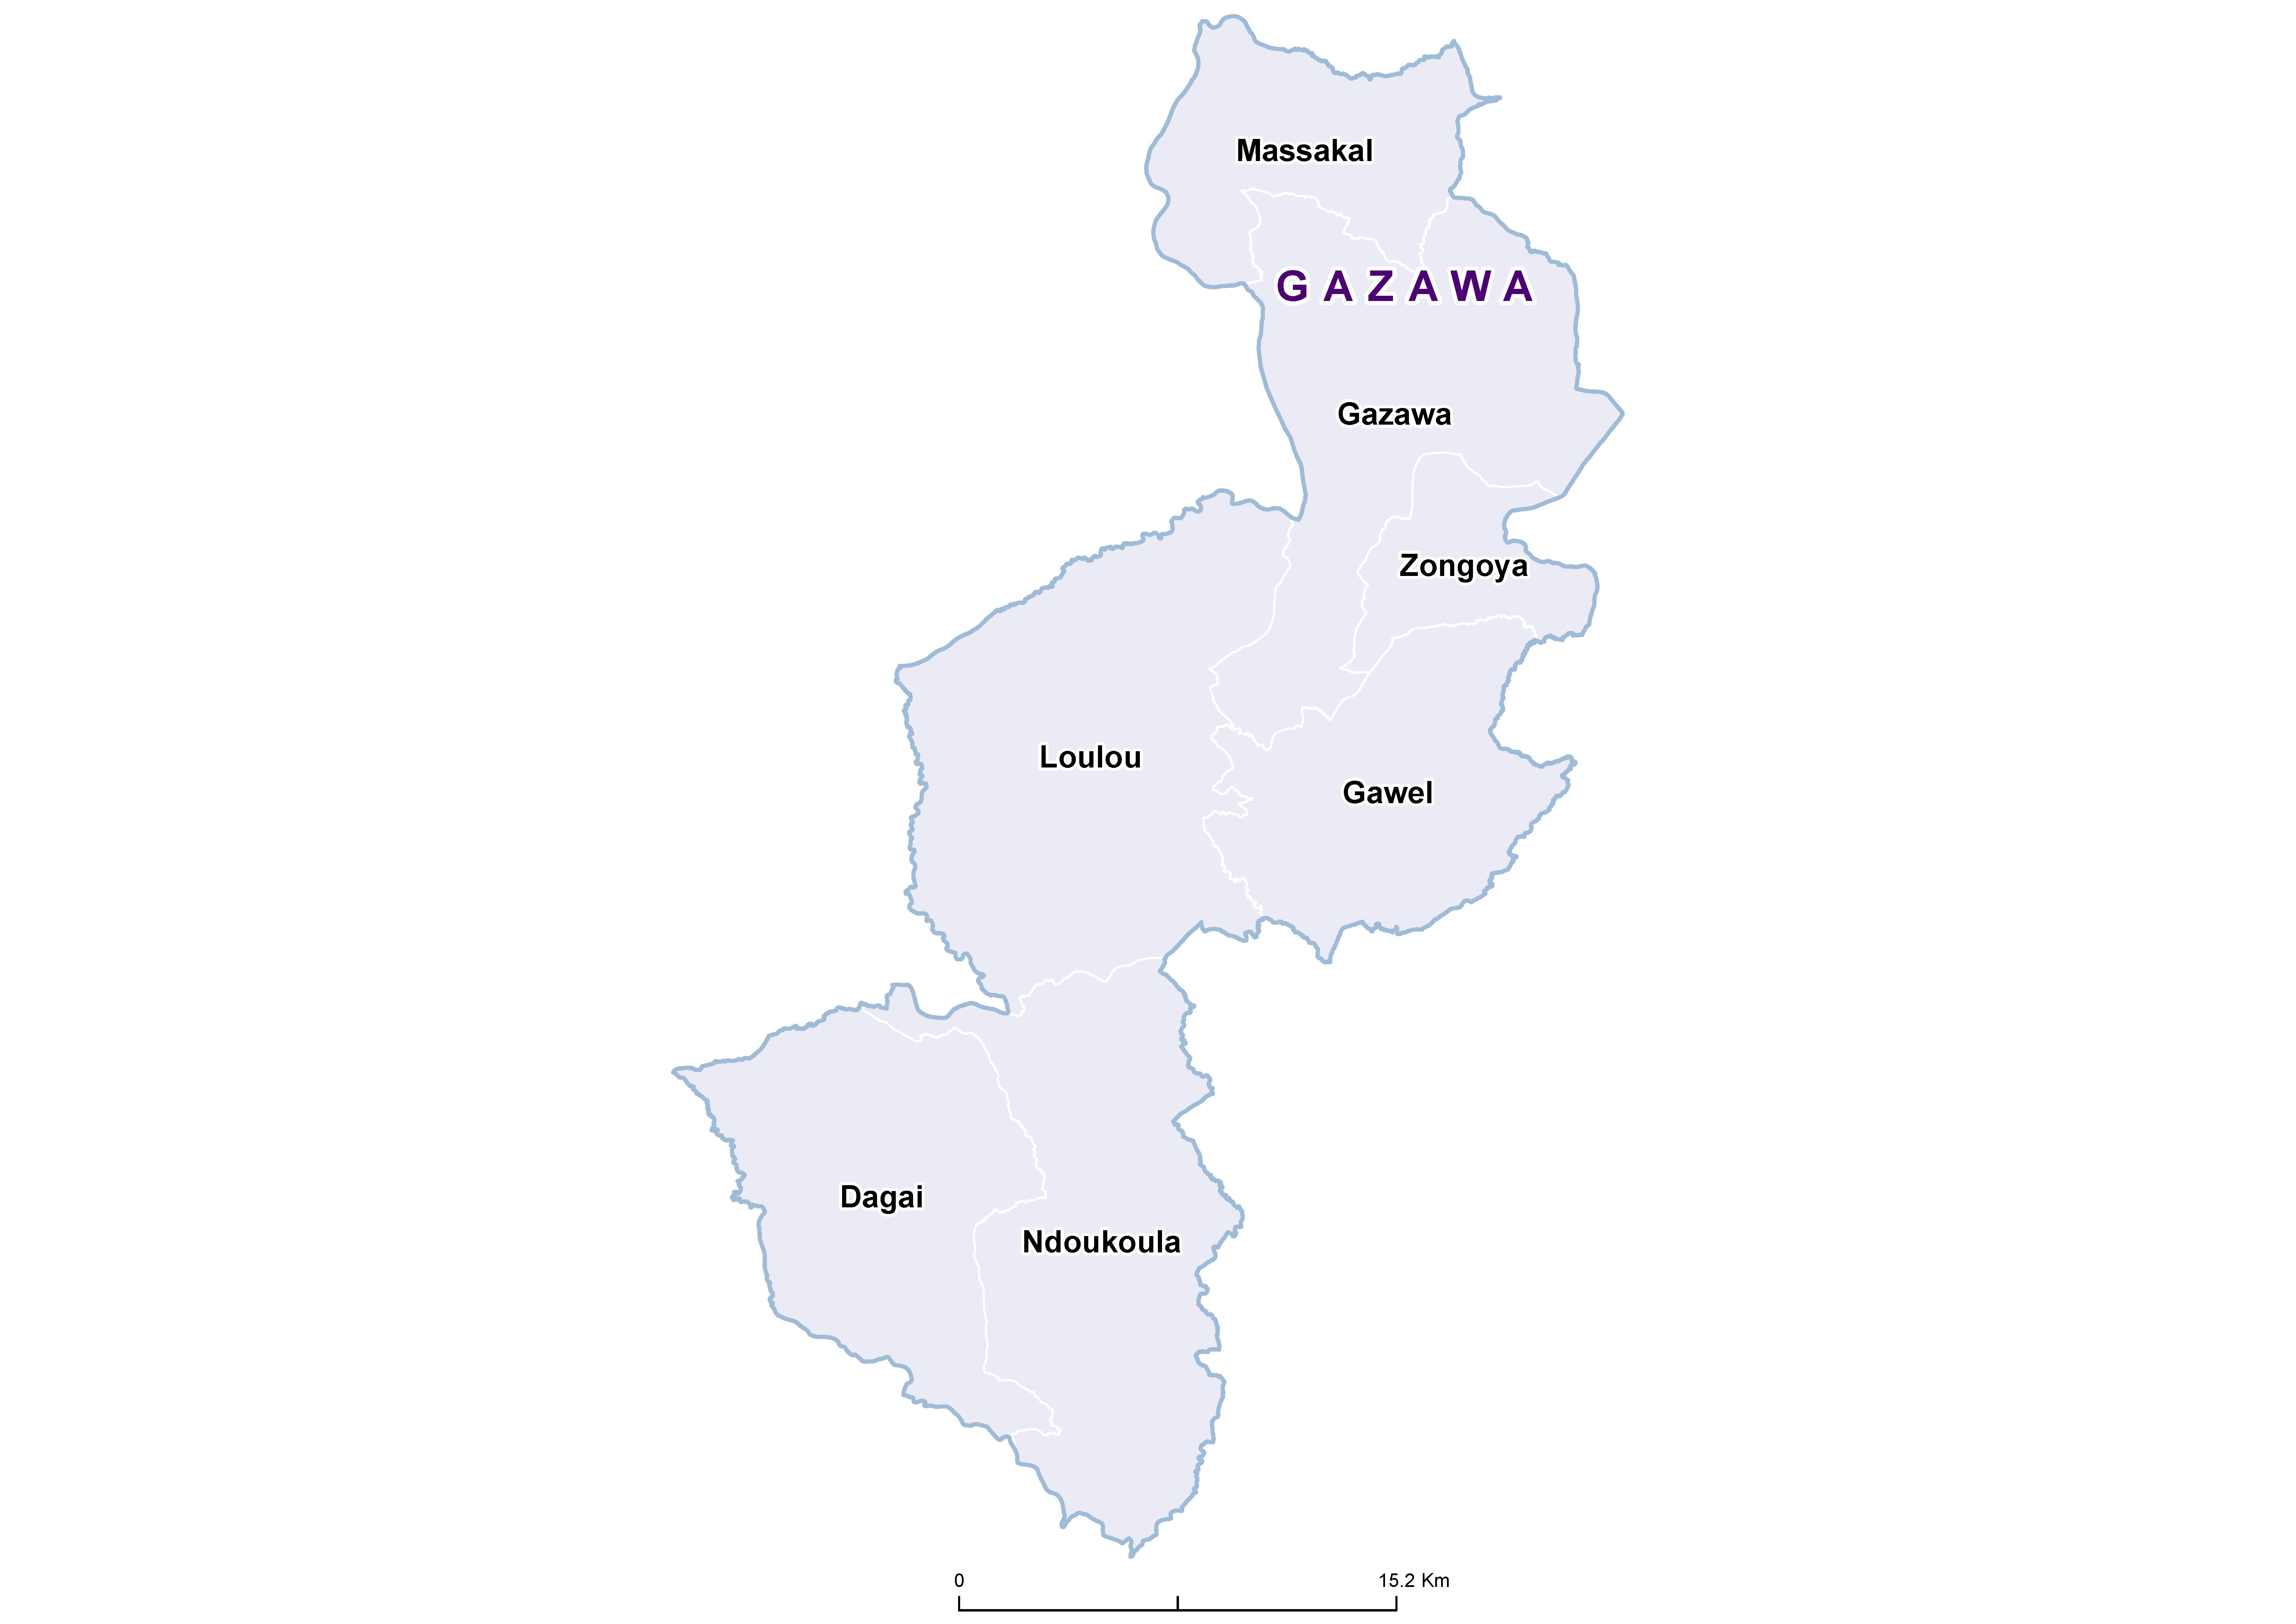 Gazawa SCH 19850001